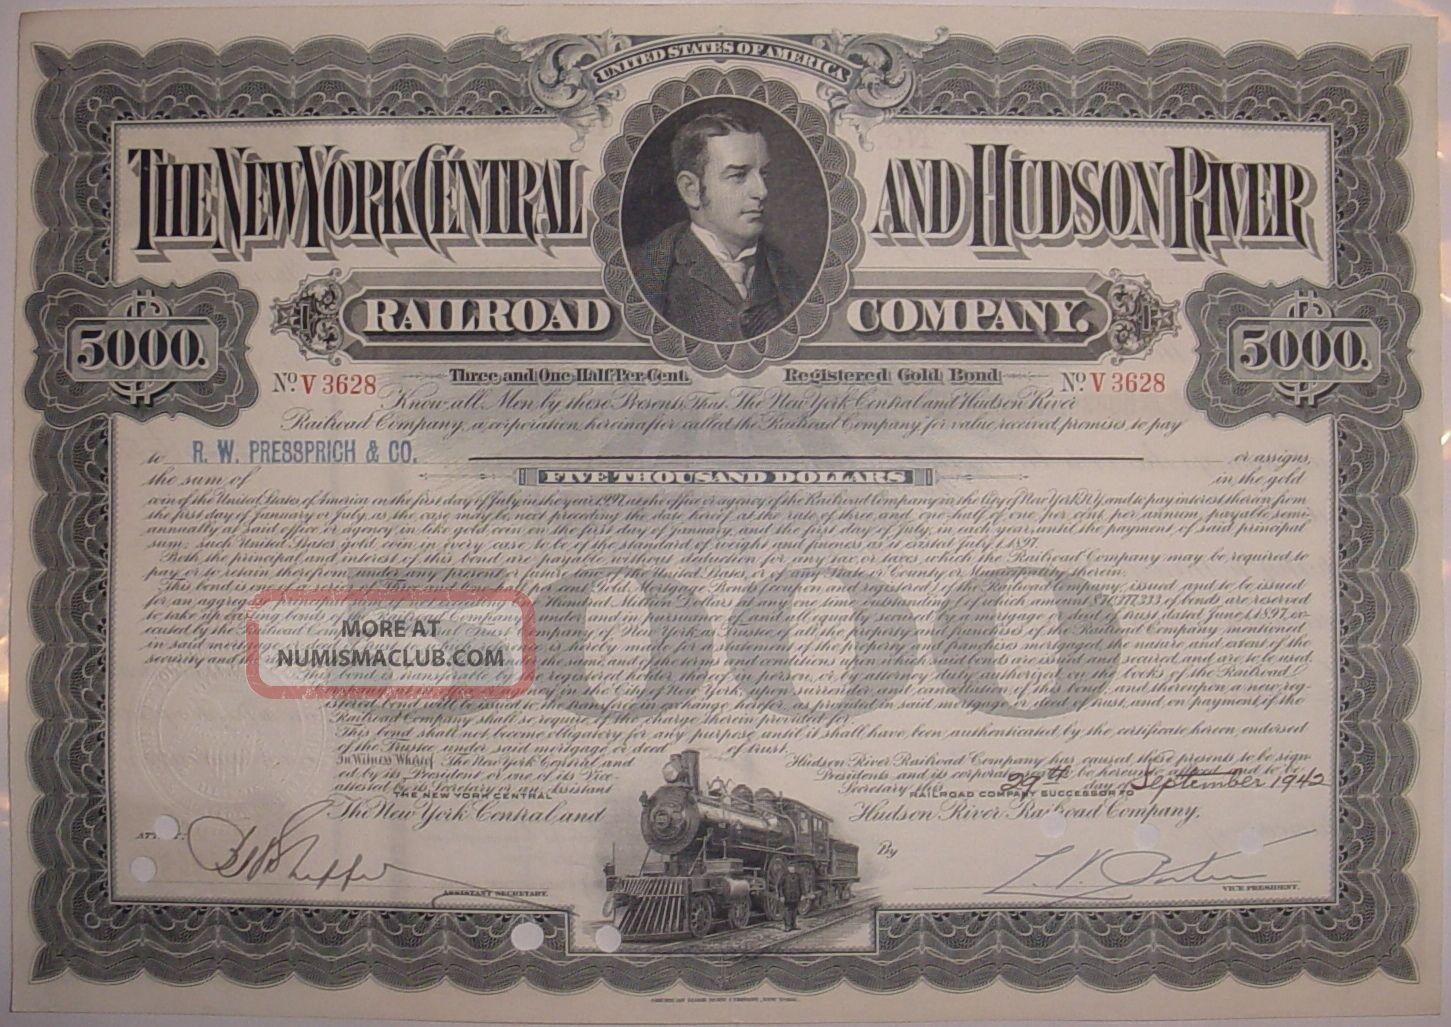 $5,  000 1940 ' S York Central And Hudson River Railroad Bond Stock Certificate Transportation photo